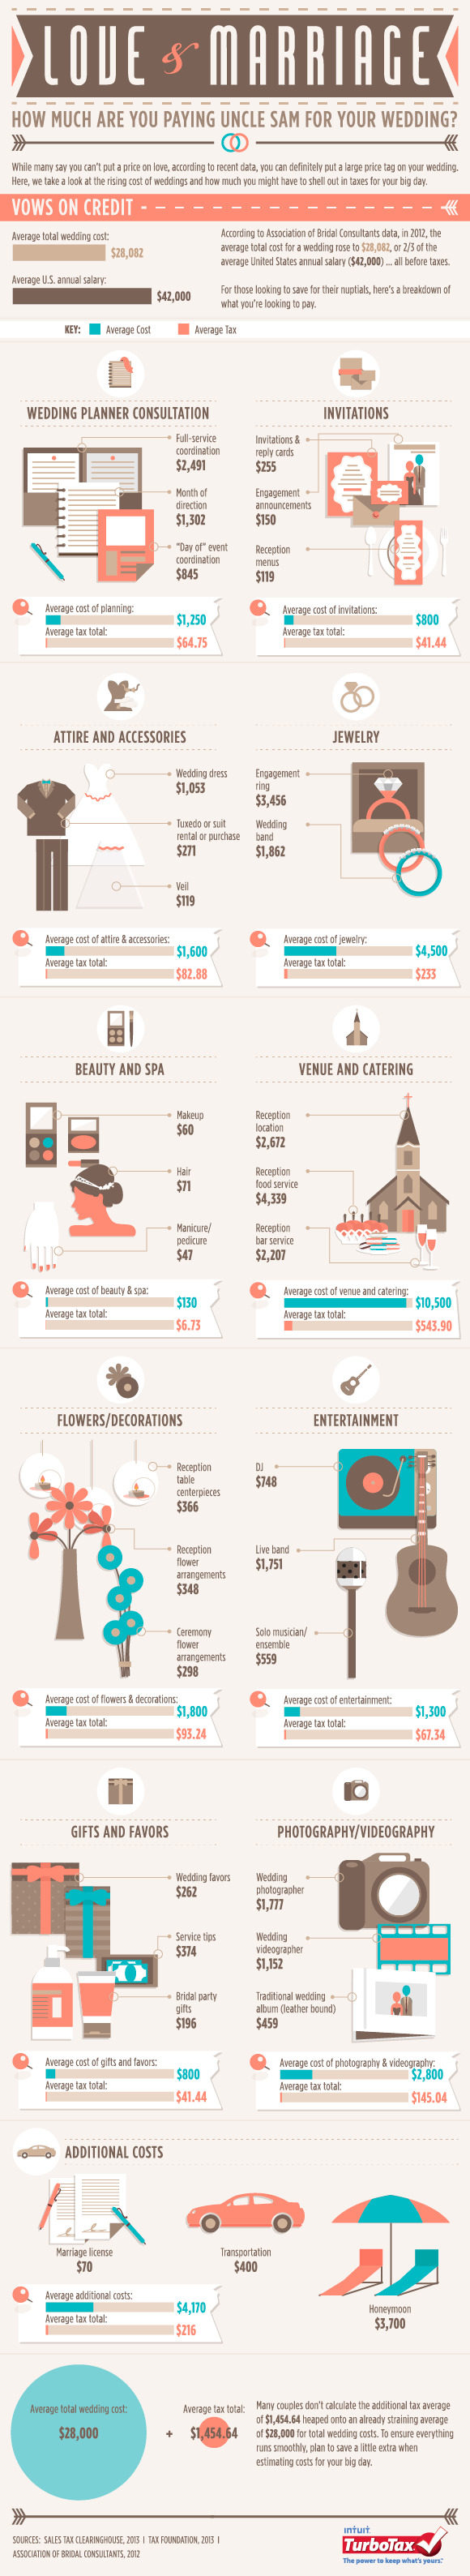 The Most Awesome Images On Internet Wedding BudgetingWedding